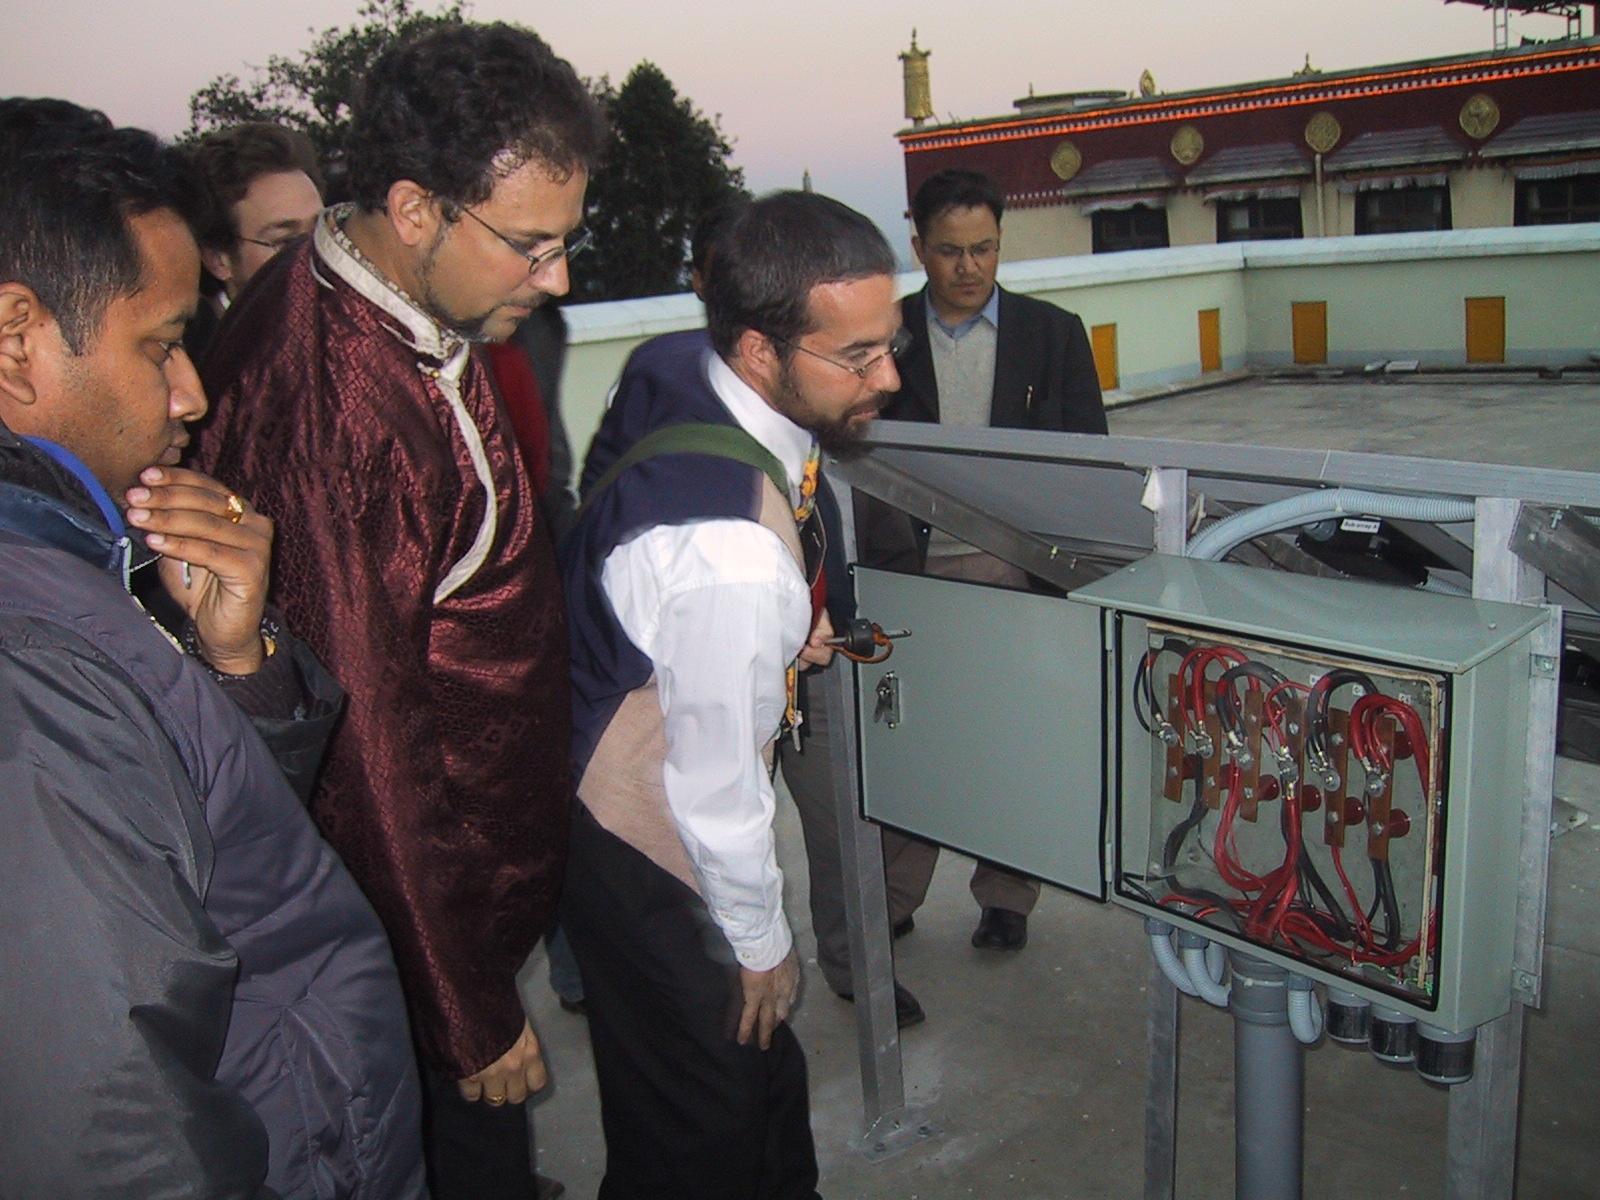 Lama Rangbar inspecting solar system circa 2004